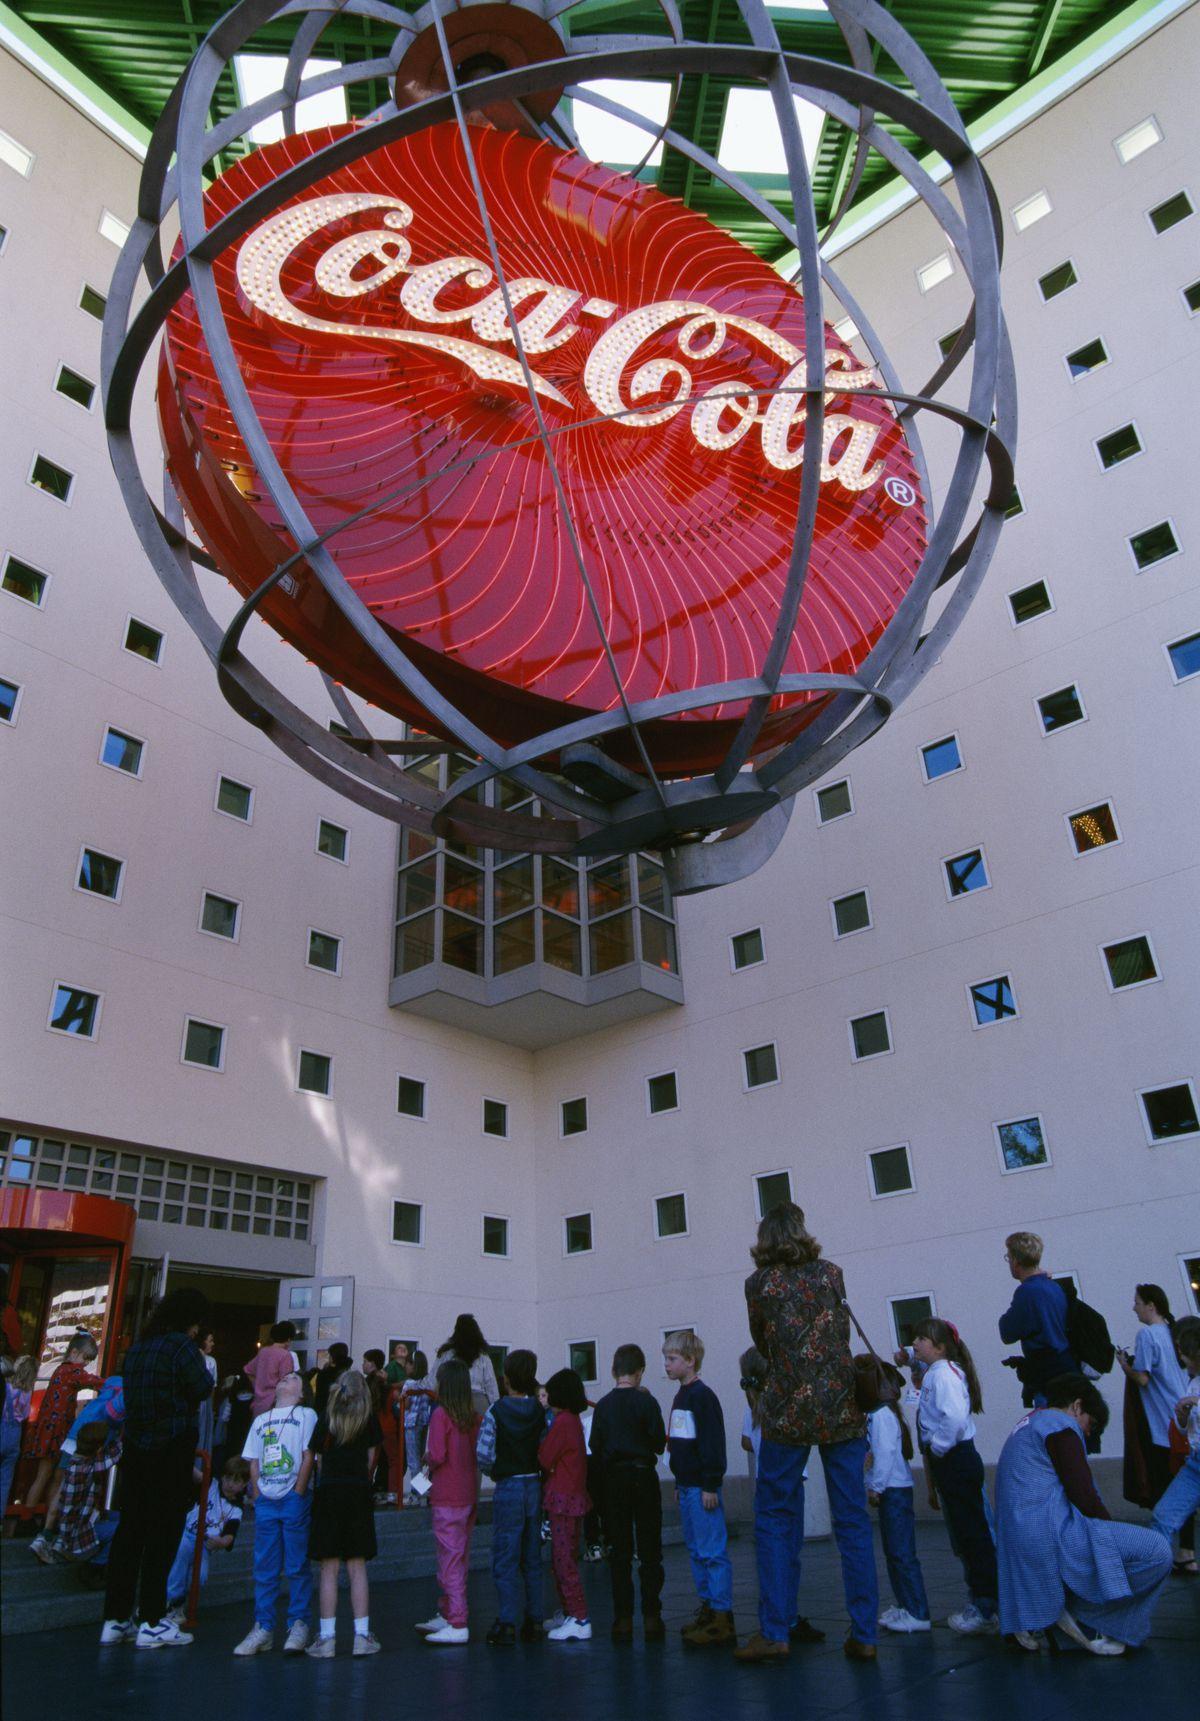 Neon Sculpture at Coca-Cola Museum in Atlanta